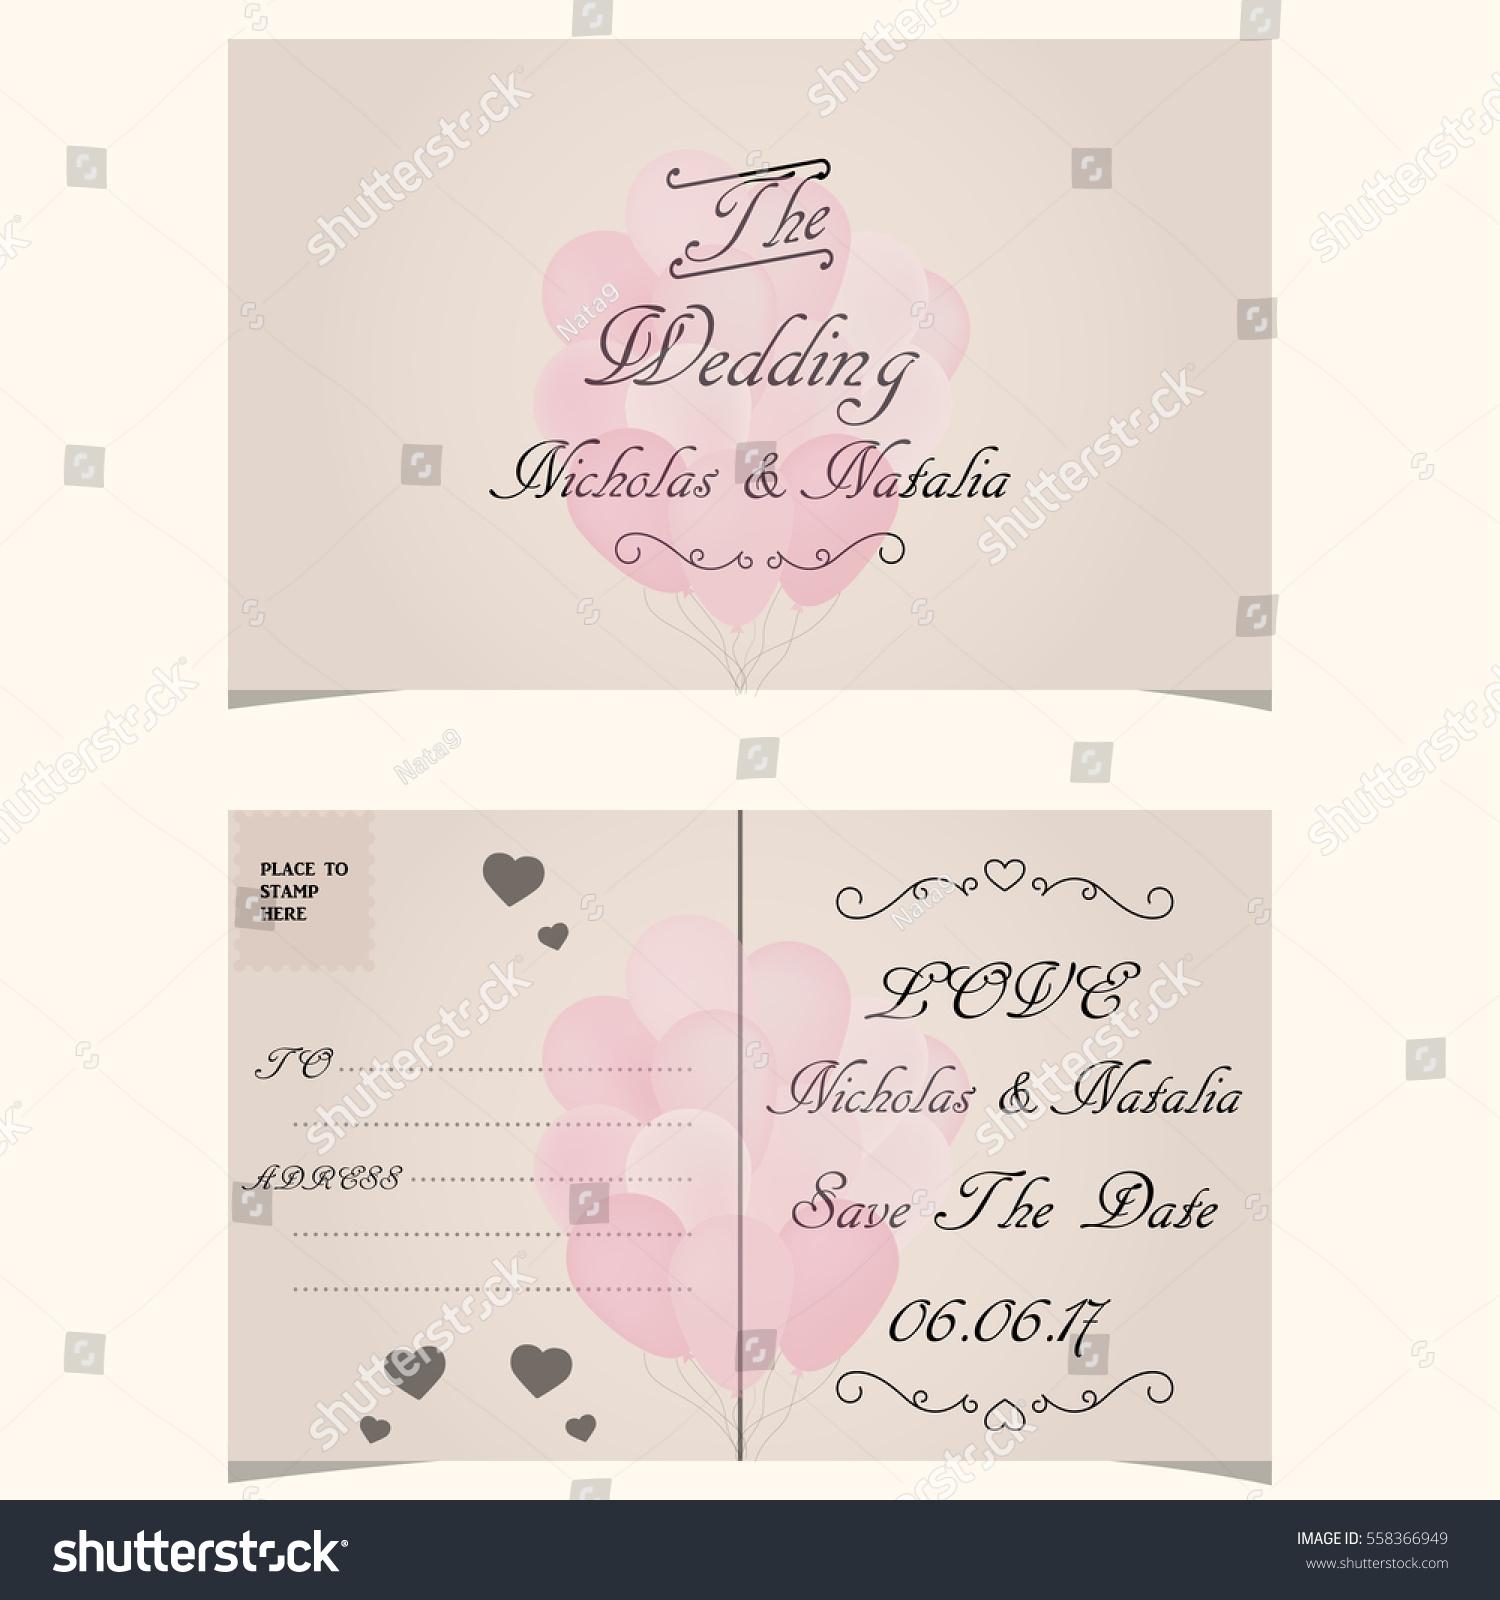 Colorful Greeting Wedding Invitation Card Illustration Stock ...